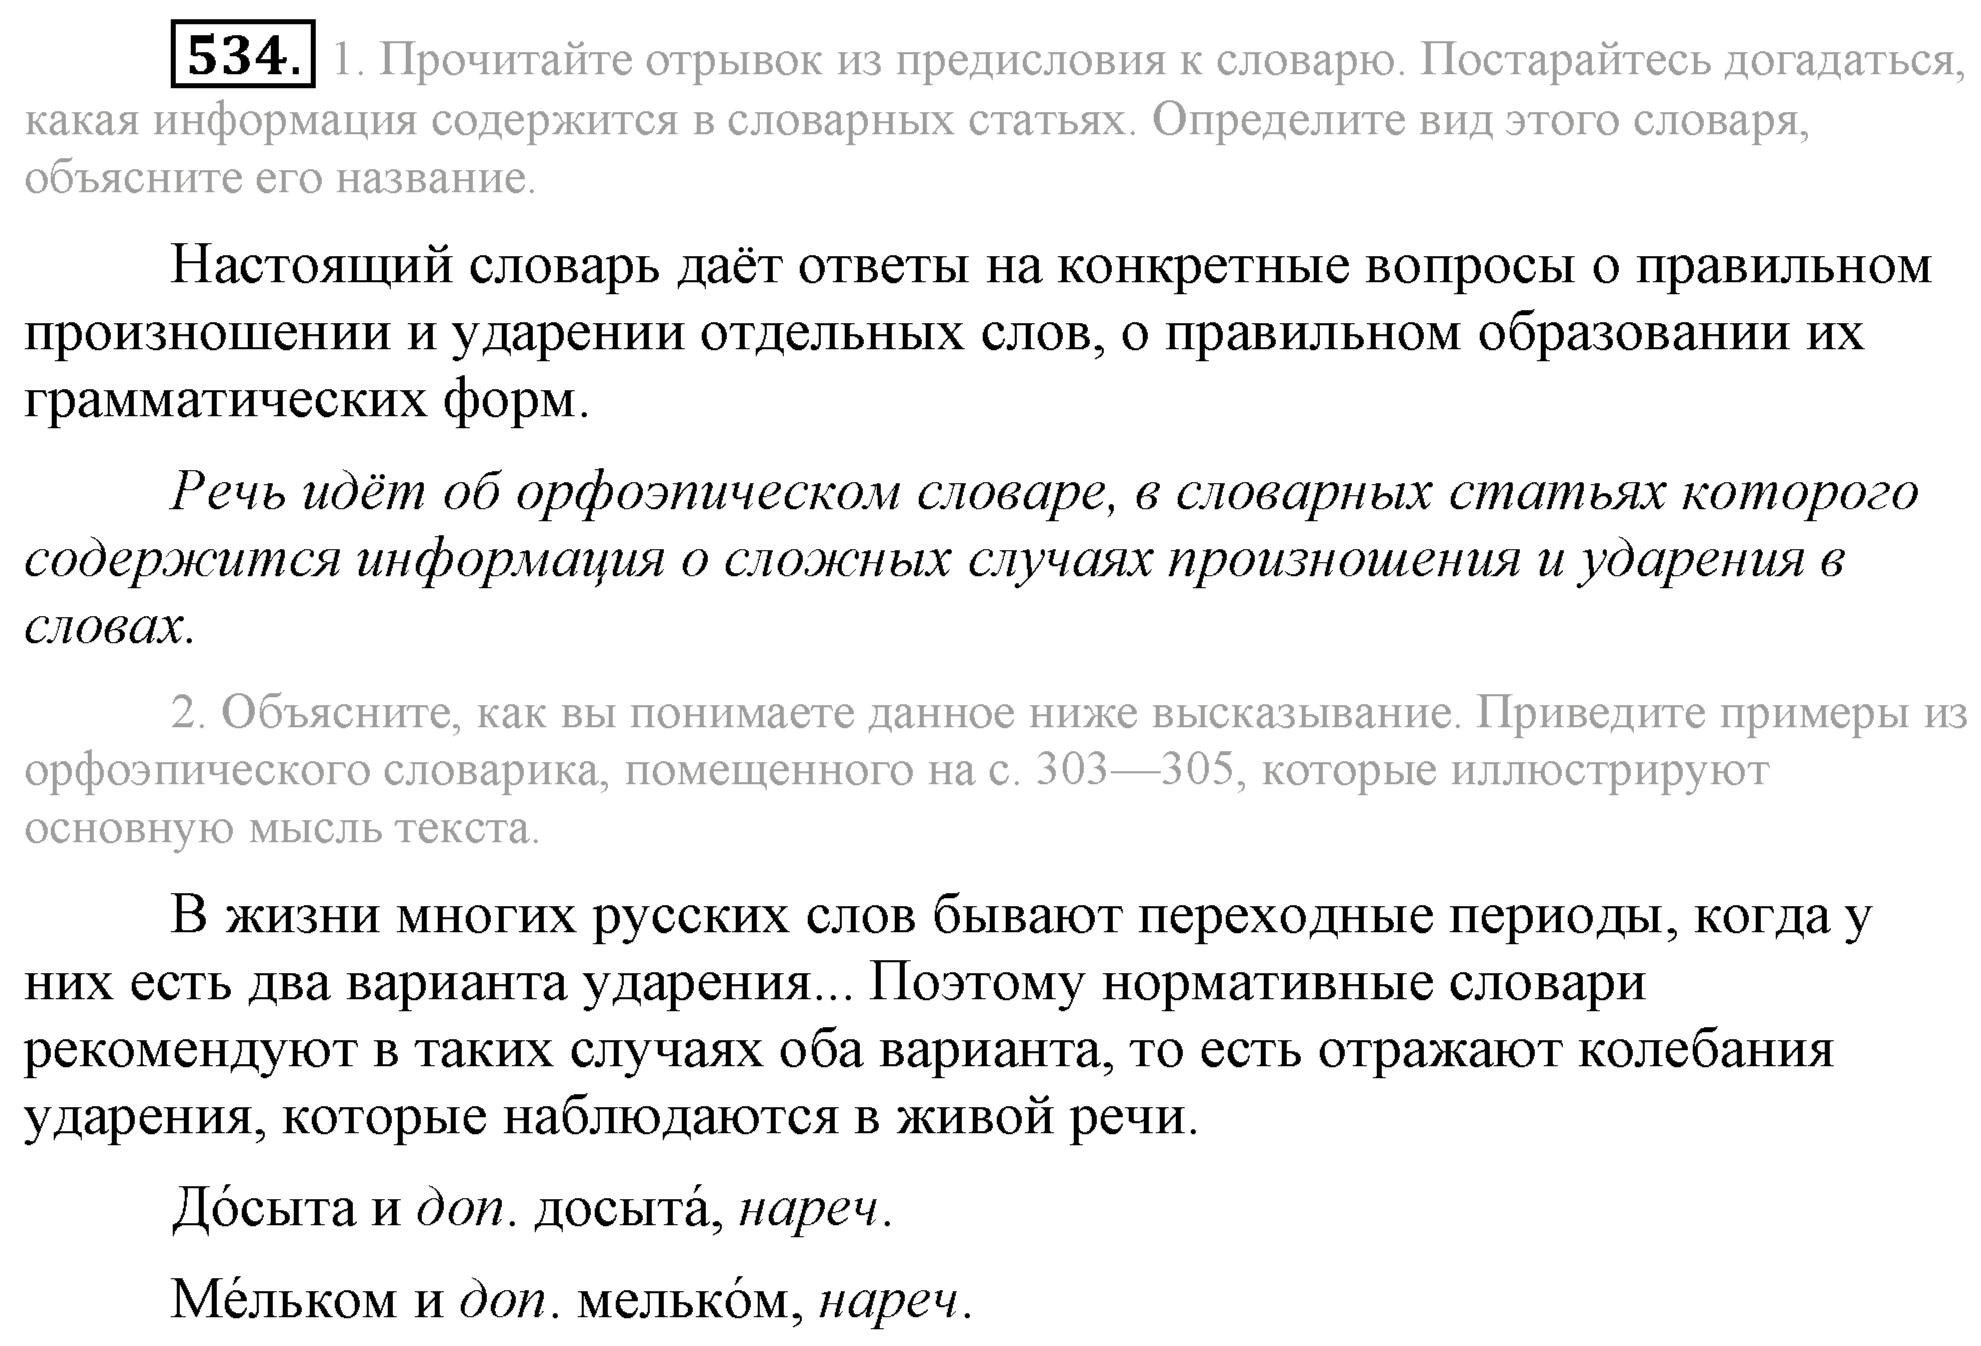 Решебник по русскаму языку за 7 класс дрофа